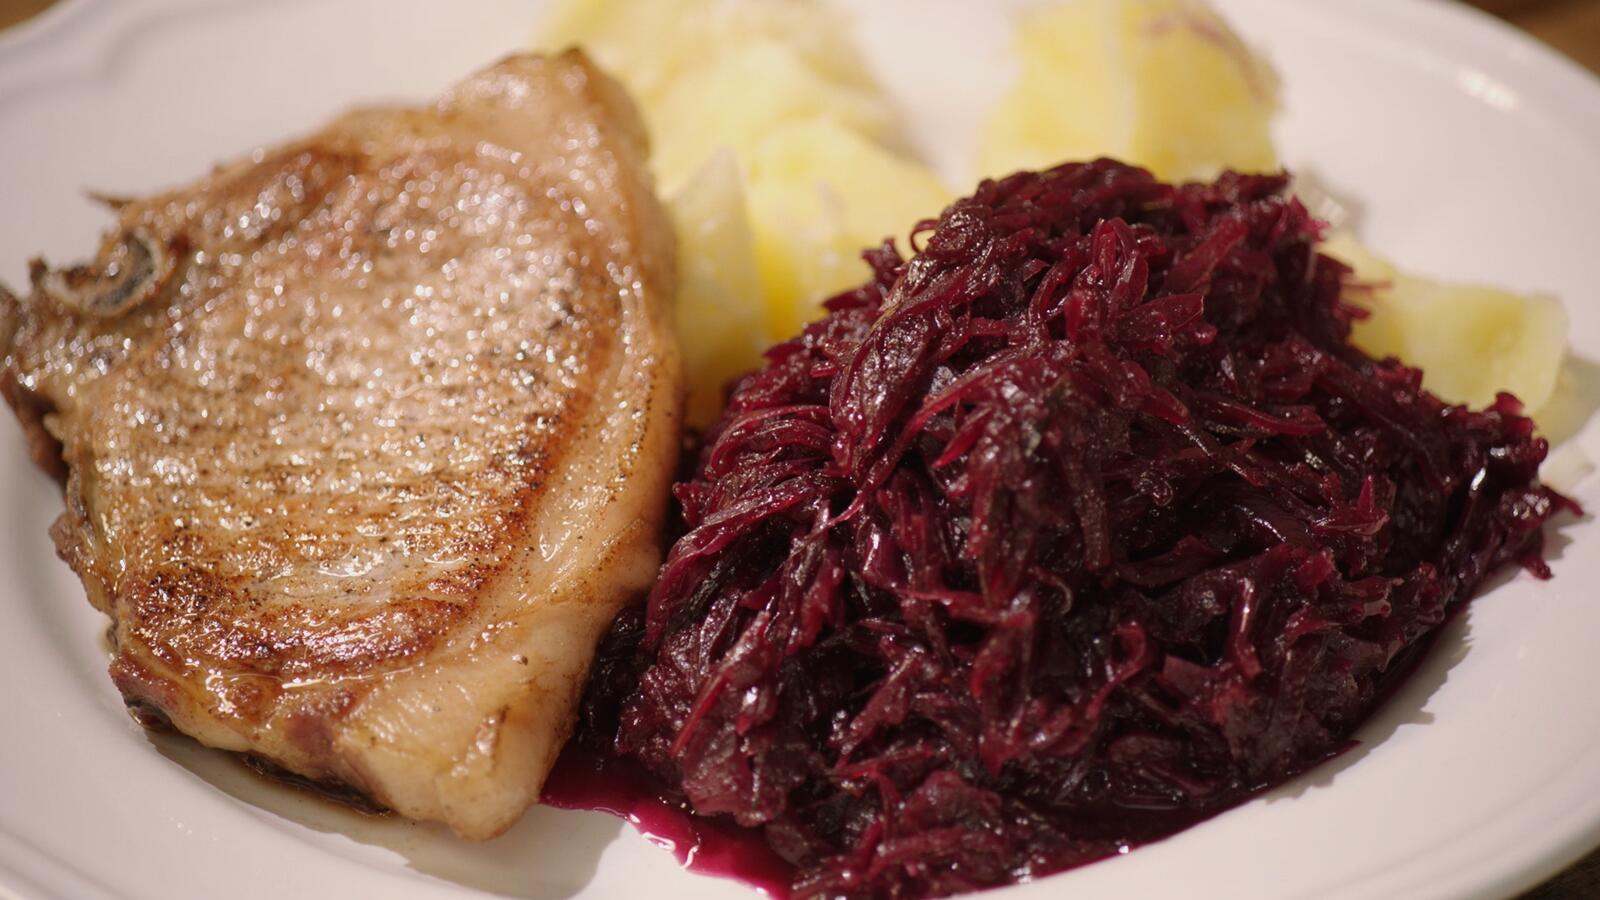 Kotelet met rodekool en gekookte aardappelen